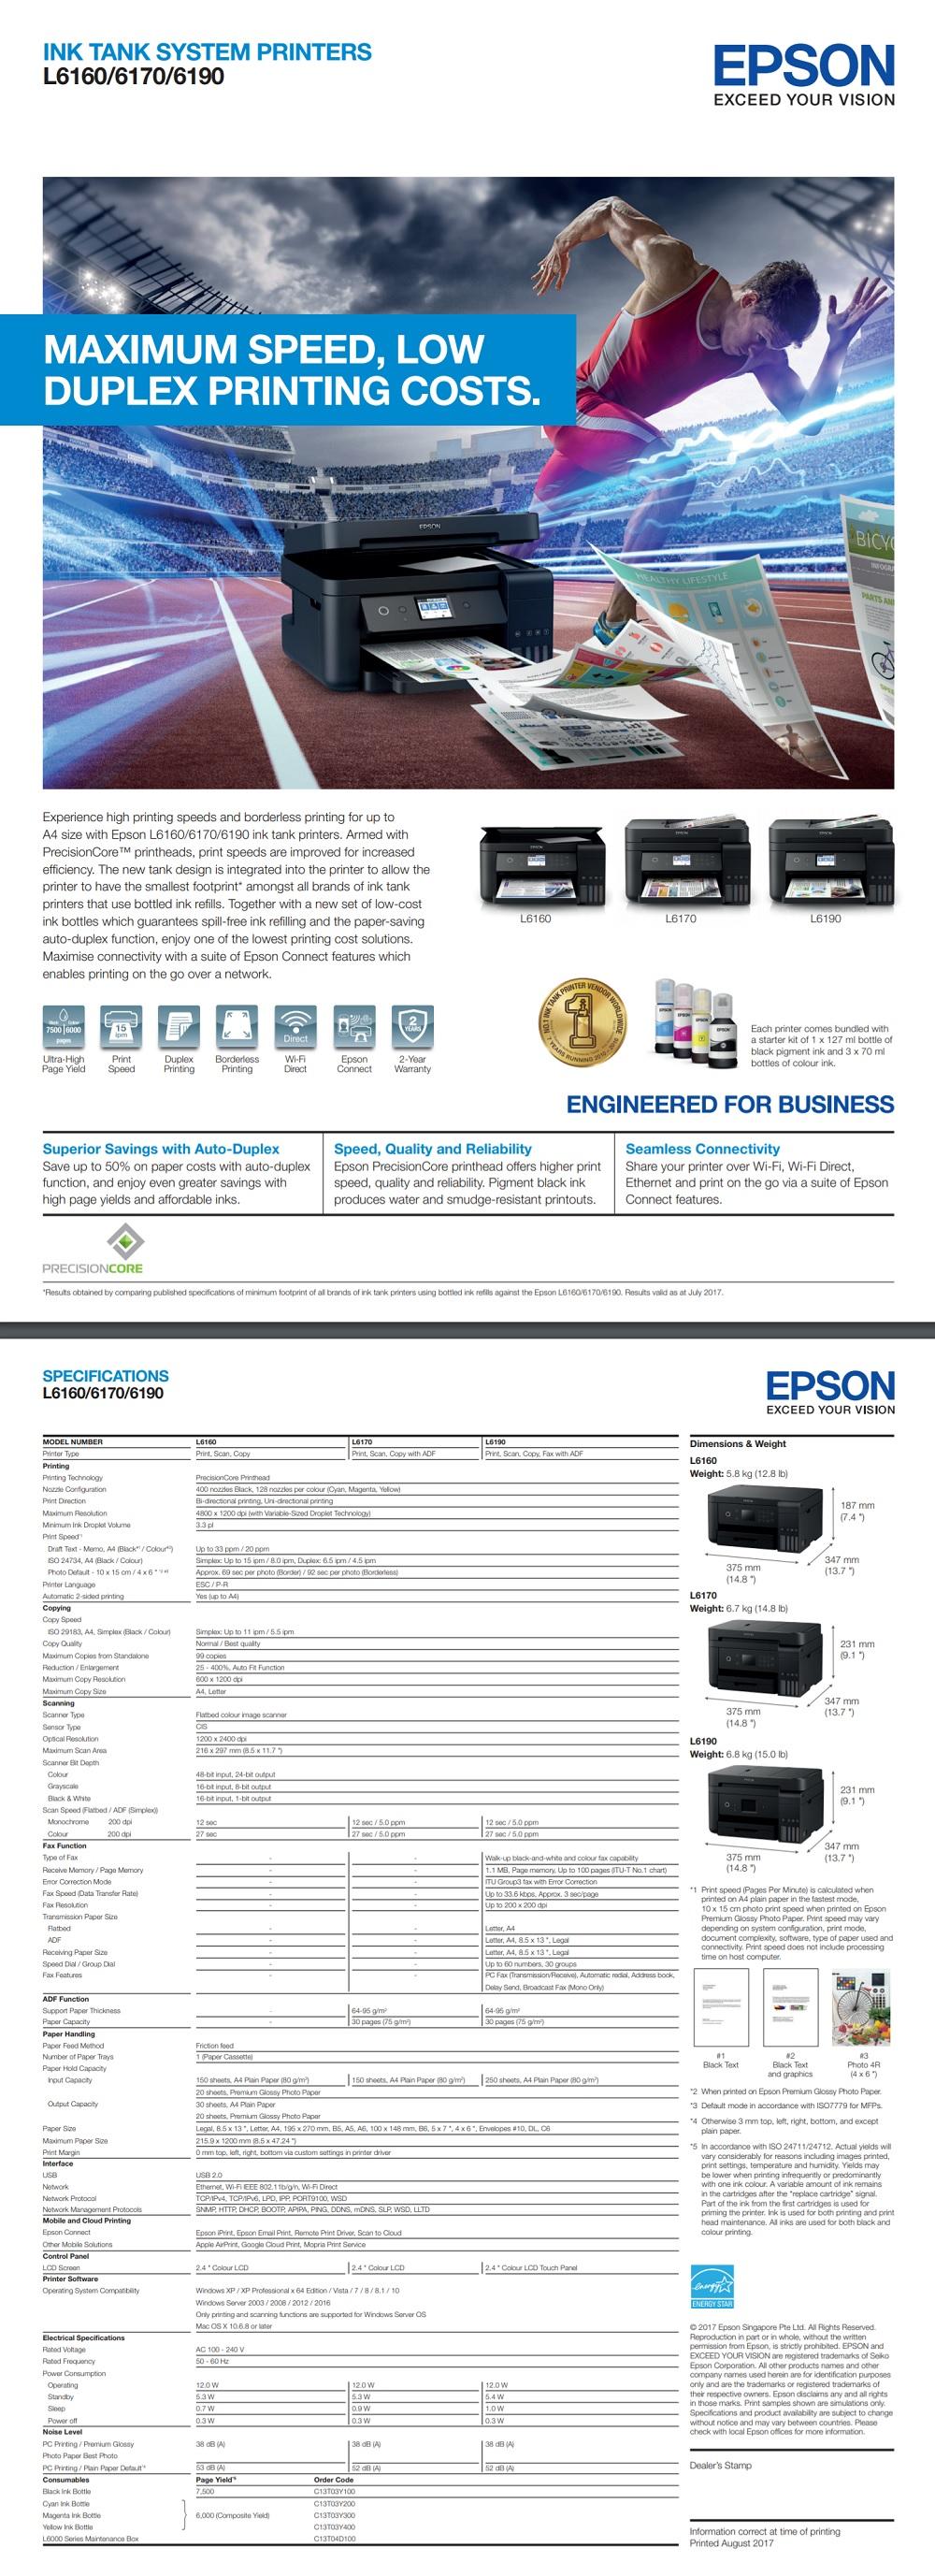 Epson EcoTank L6170 Ink Tank Printer A4 Multi-Function Colour Inkjet for  Office